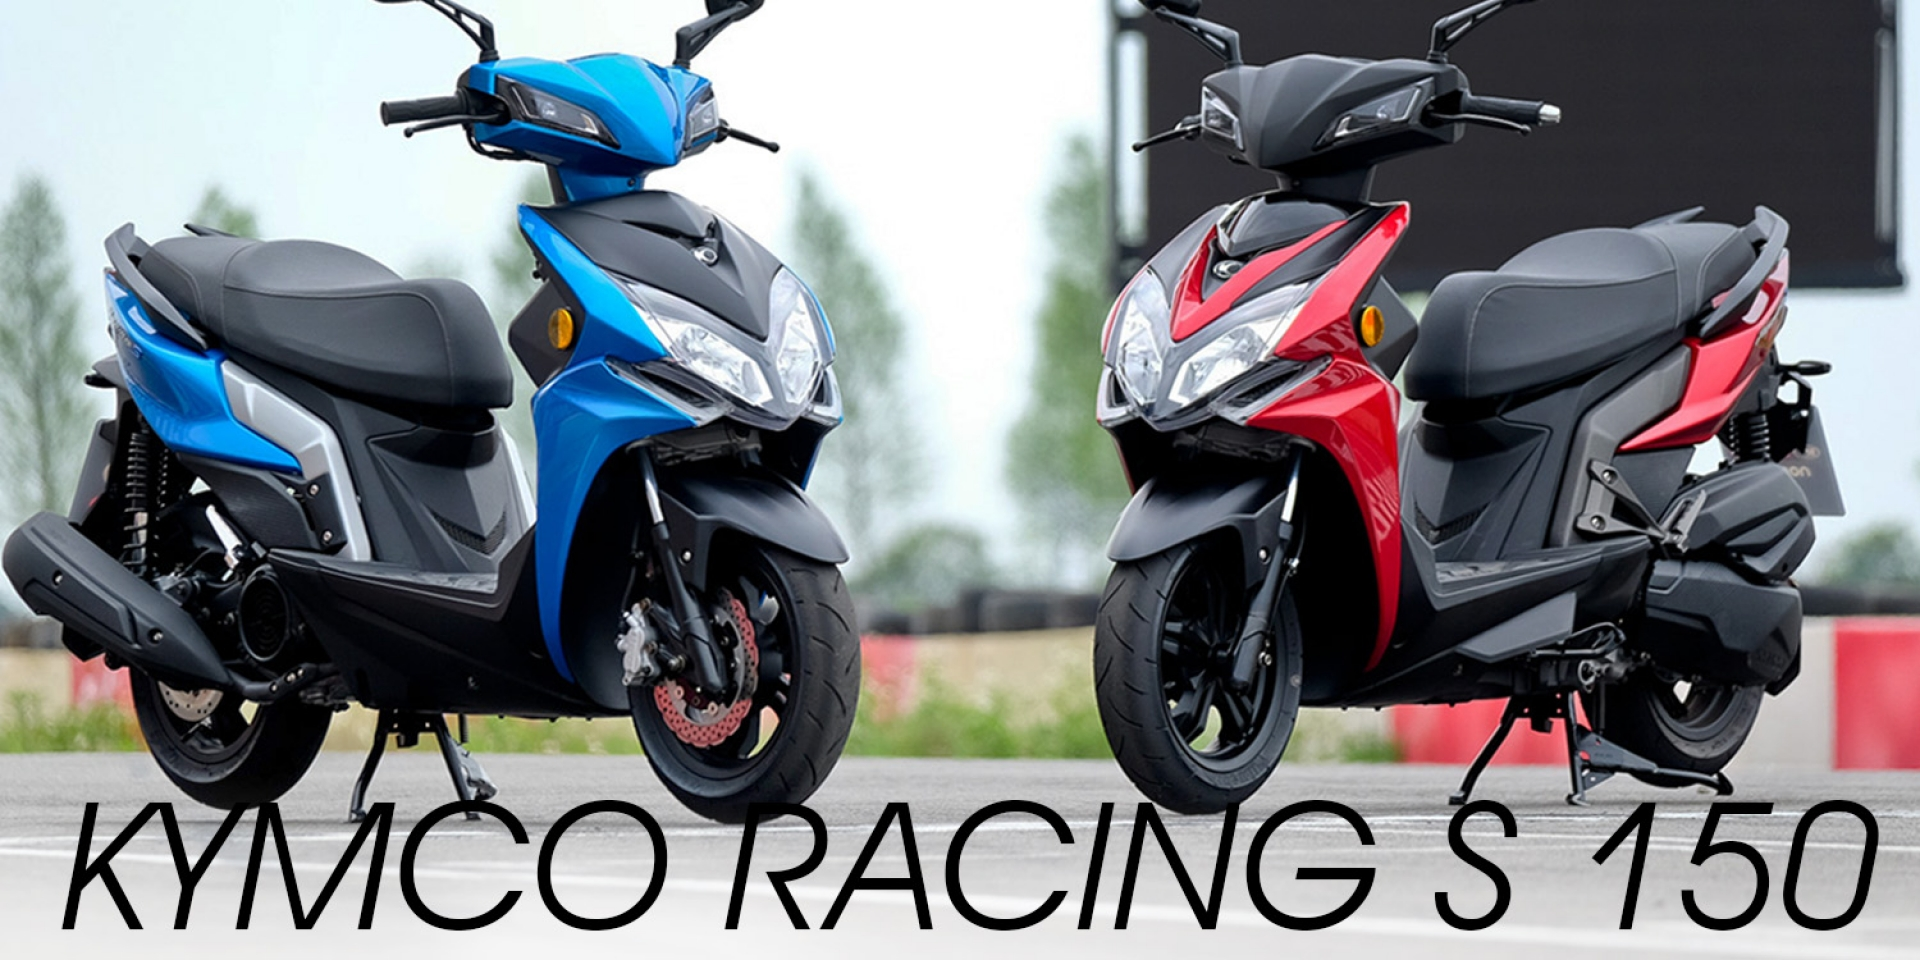 KYMCO RACING S 150研發剖析/賽道試駕報告